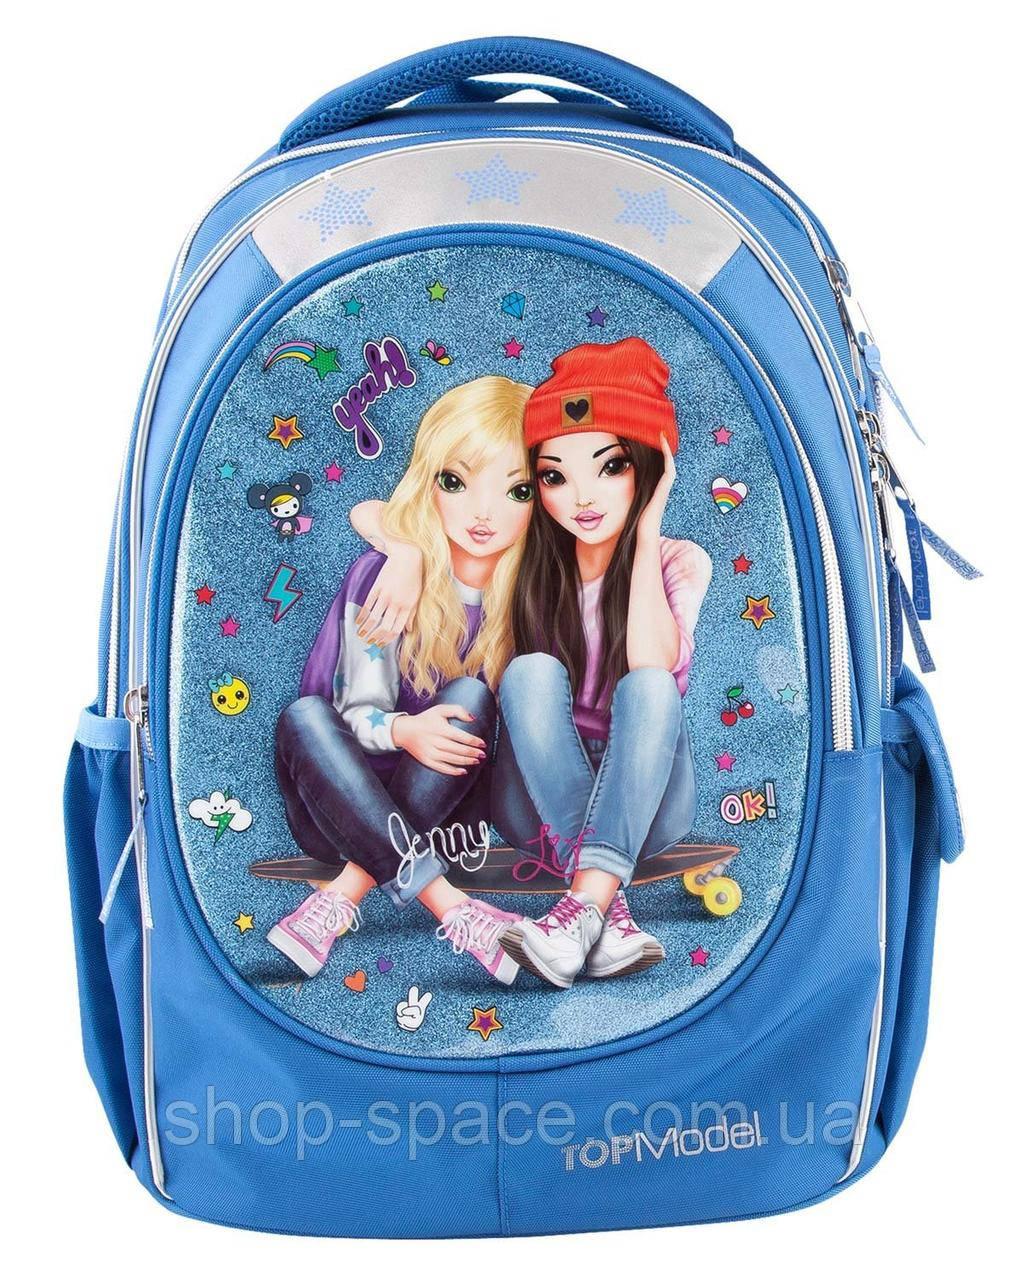 Рюкзак TOP Model Друзья (синий)